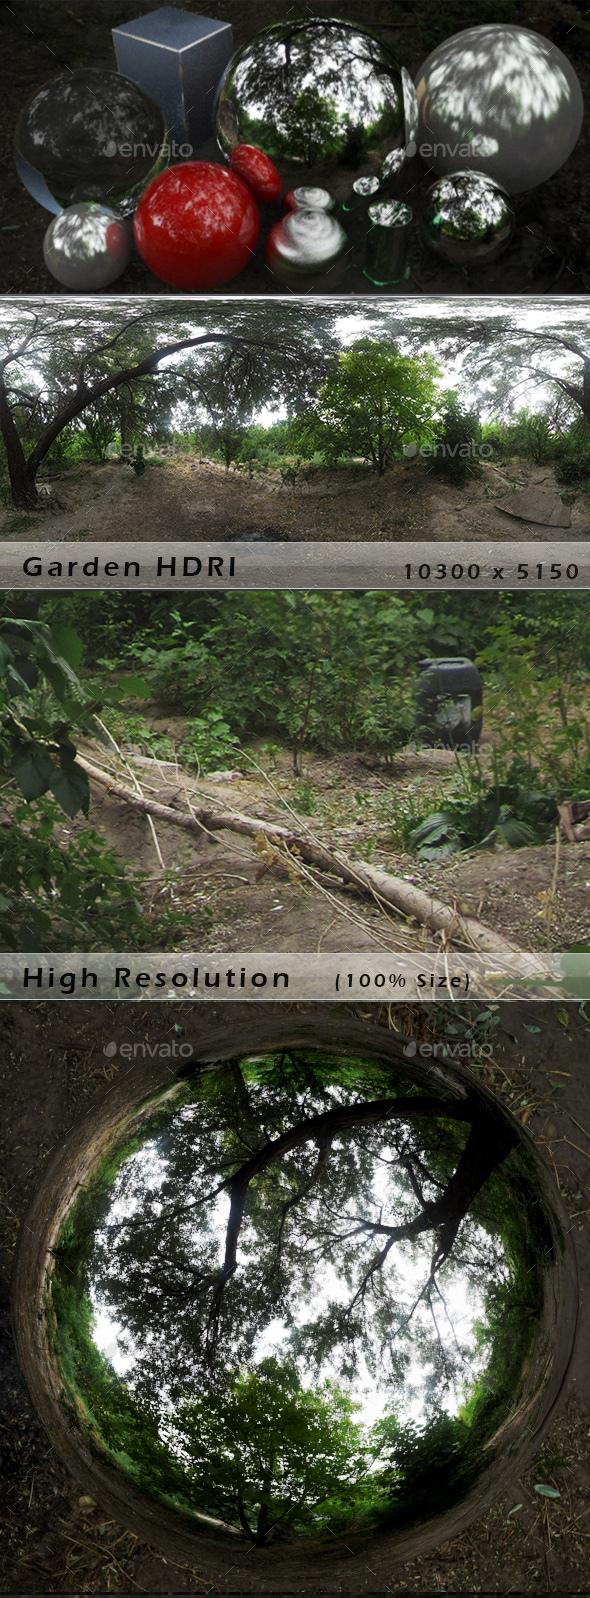 Garden HDRI